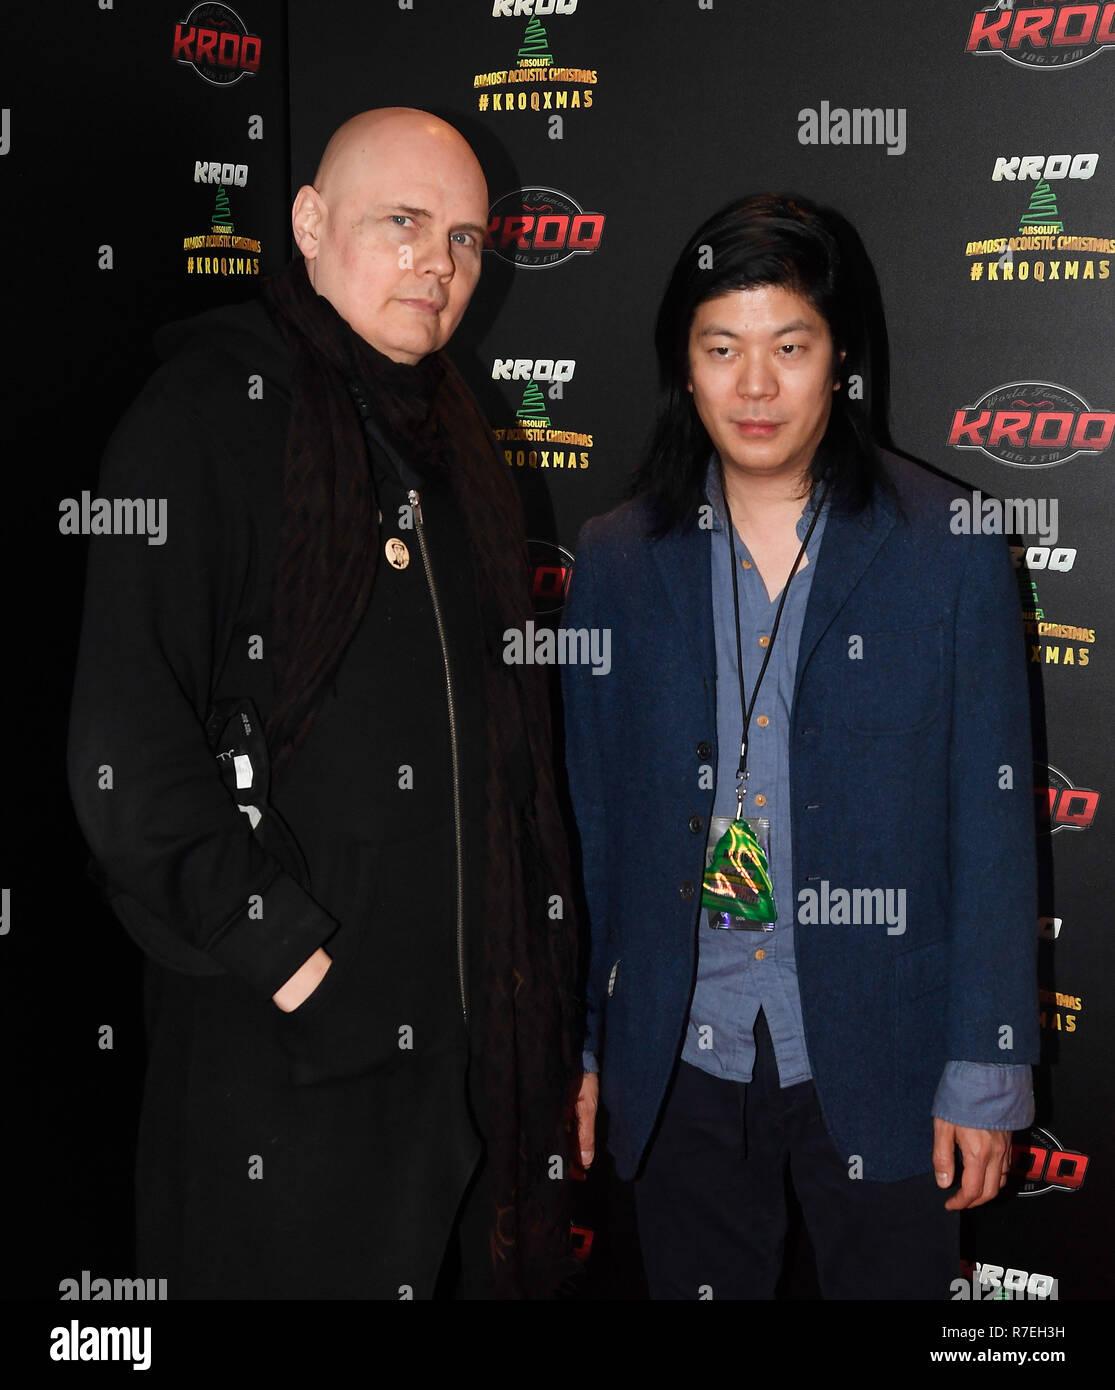 Smashing Pumpkins Forum Almost Acoustic Christmas 2020 California, USA. 8th Dec 2018. Billy Corgan and James Iha of The